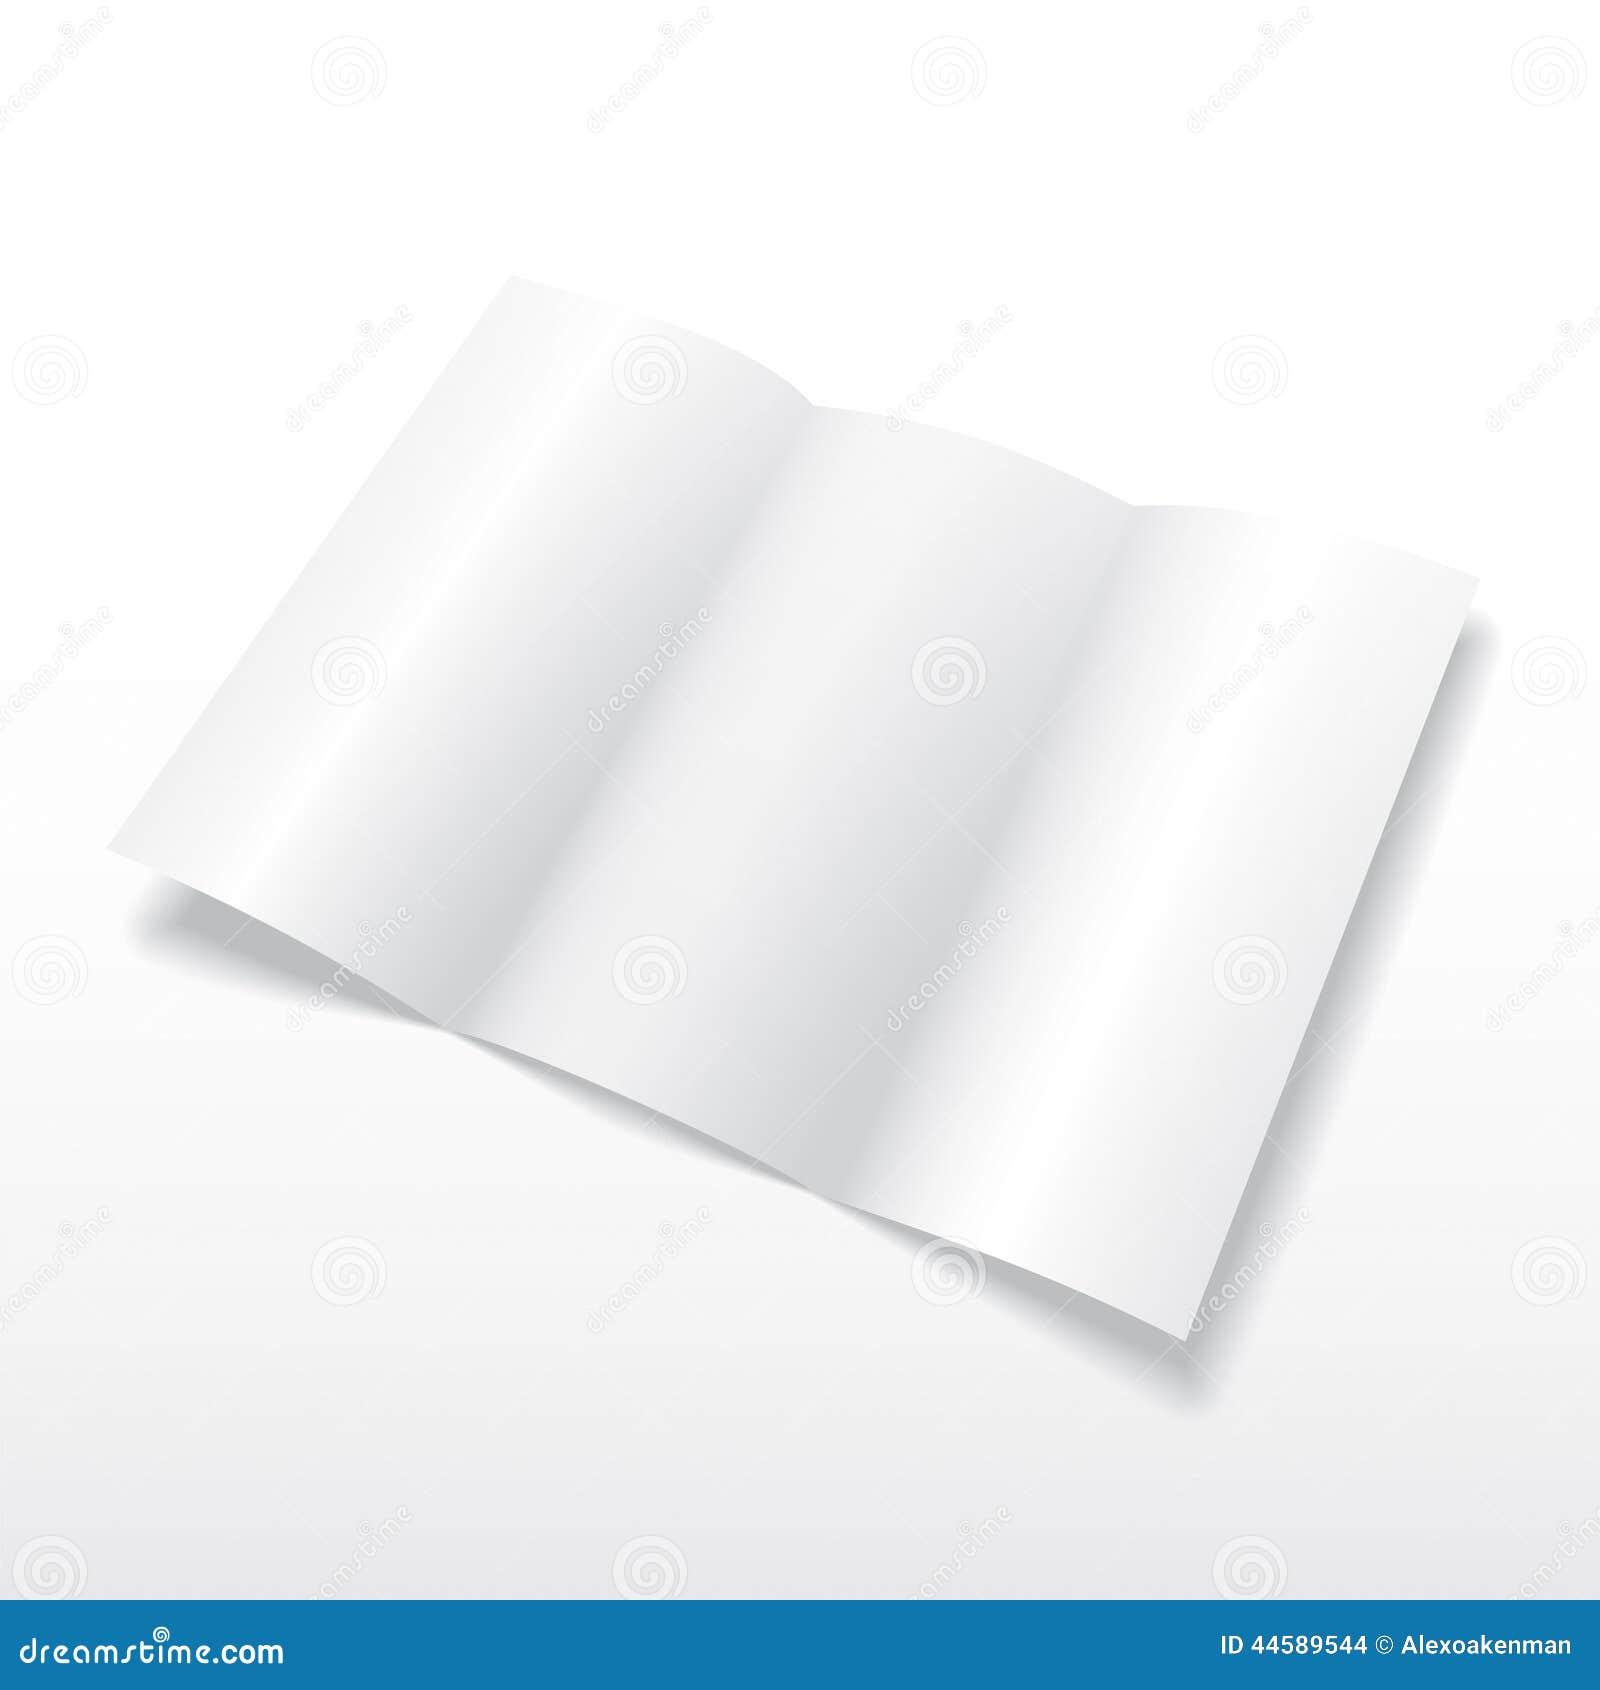 Blank Tri Fold Brochure Template Blank Tri Fold Brochure Template – Blank Tri Fold Brochure Template